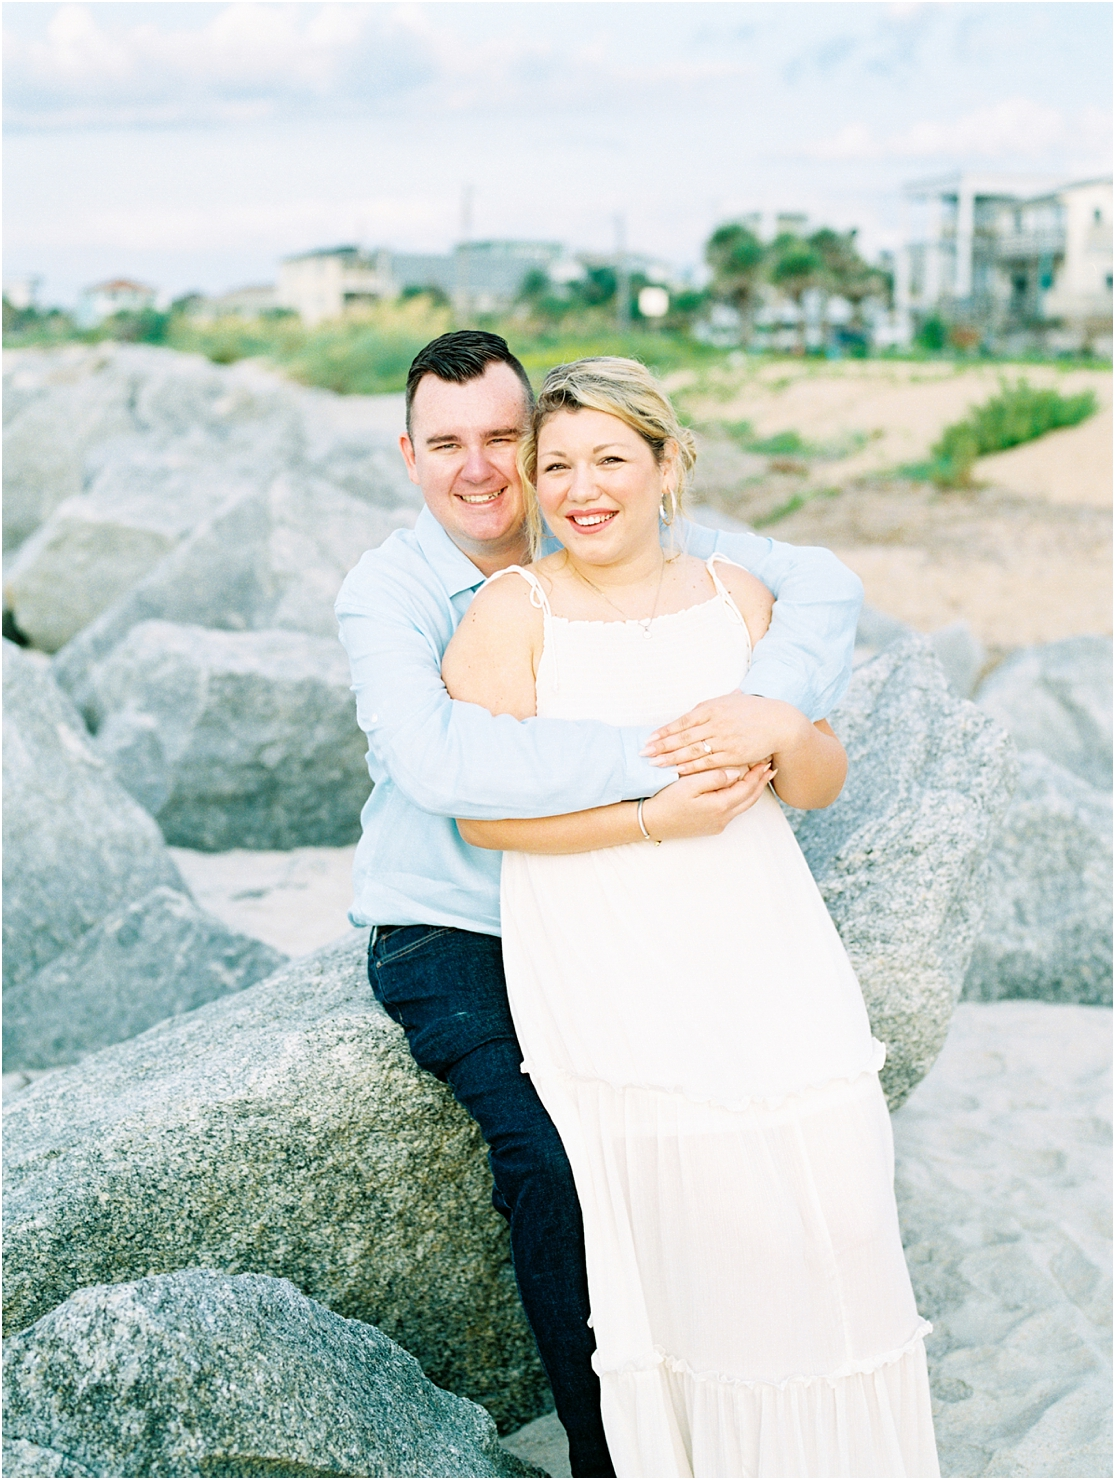 Lisa Silva Photography- Ponte Vedra Beach, St. Augustine and Jacksonville, Florida Fine Art Film Wedding Photography- Sunrise Engagement Session at  Vilano Beach_0012-1.jpg